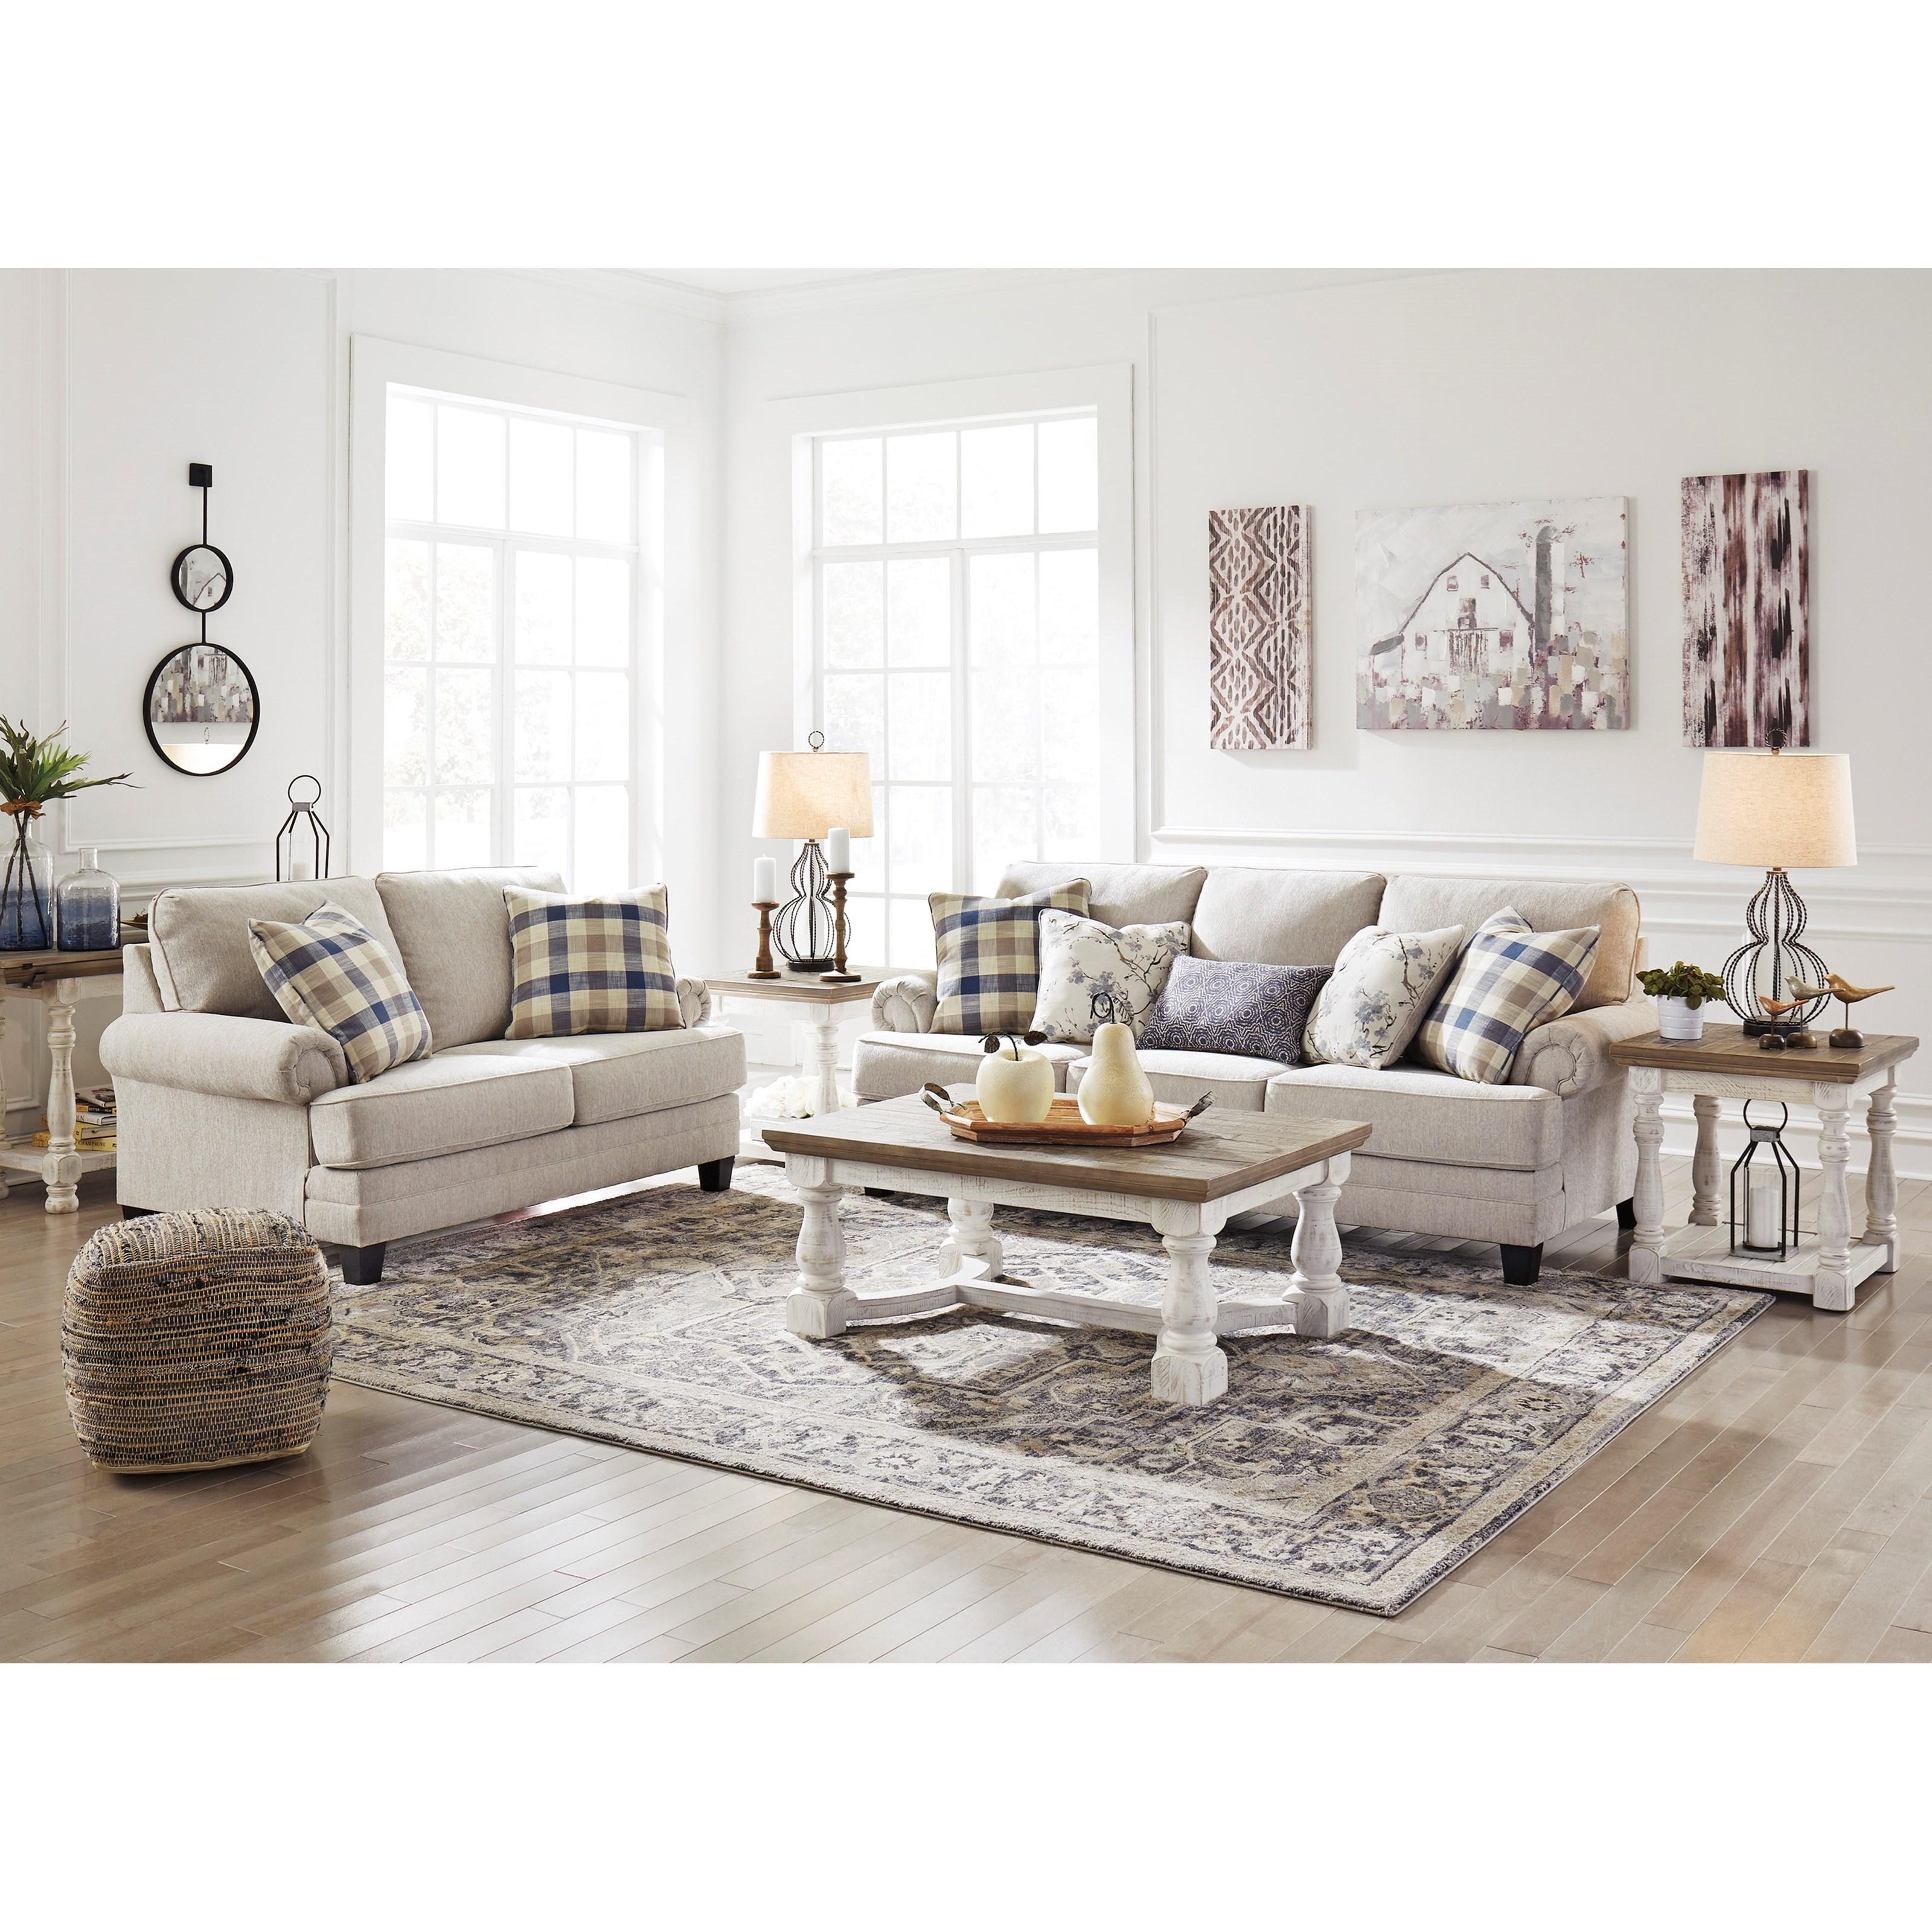 Benchcraft By Ashley Meggett Queen Sofa Sleeper With